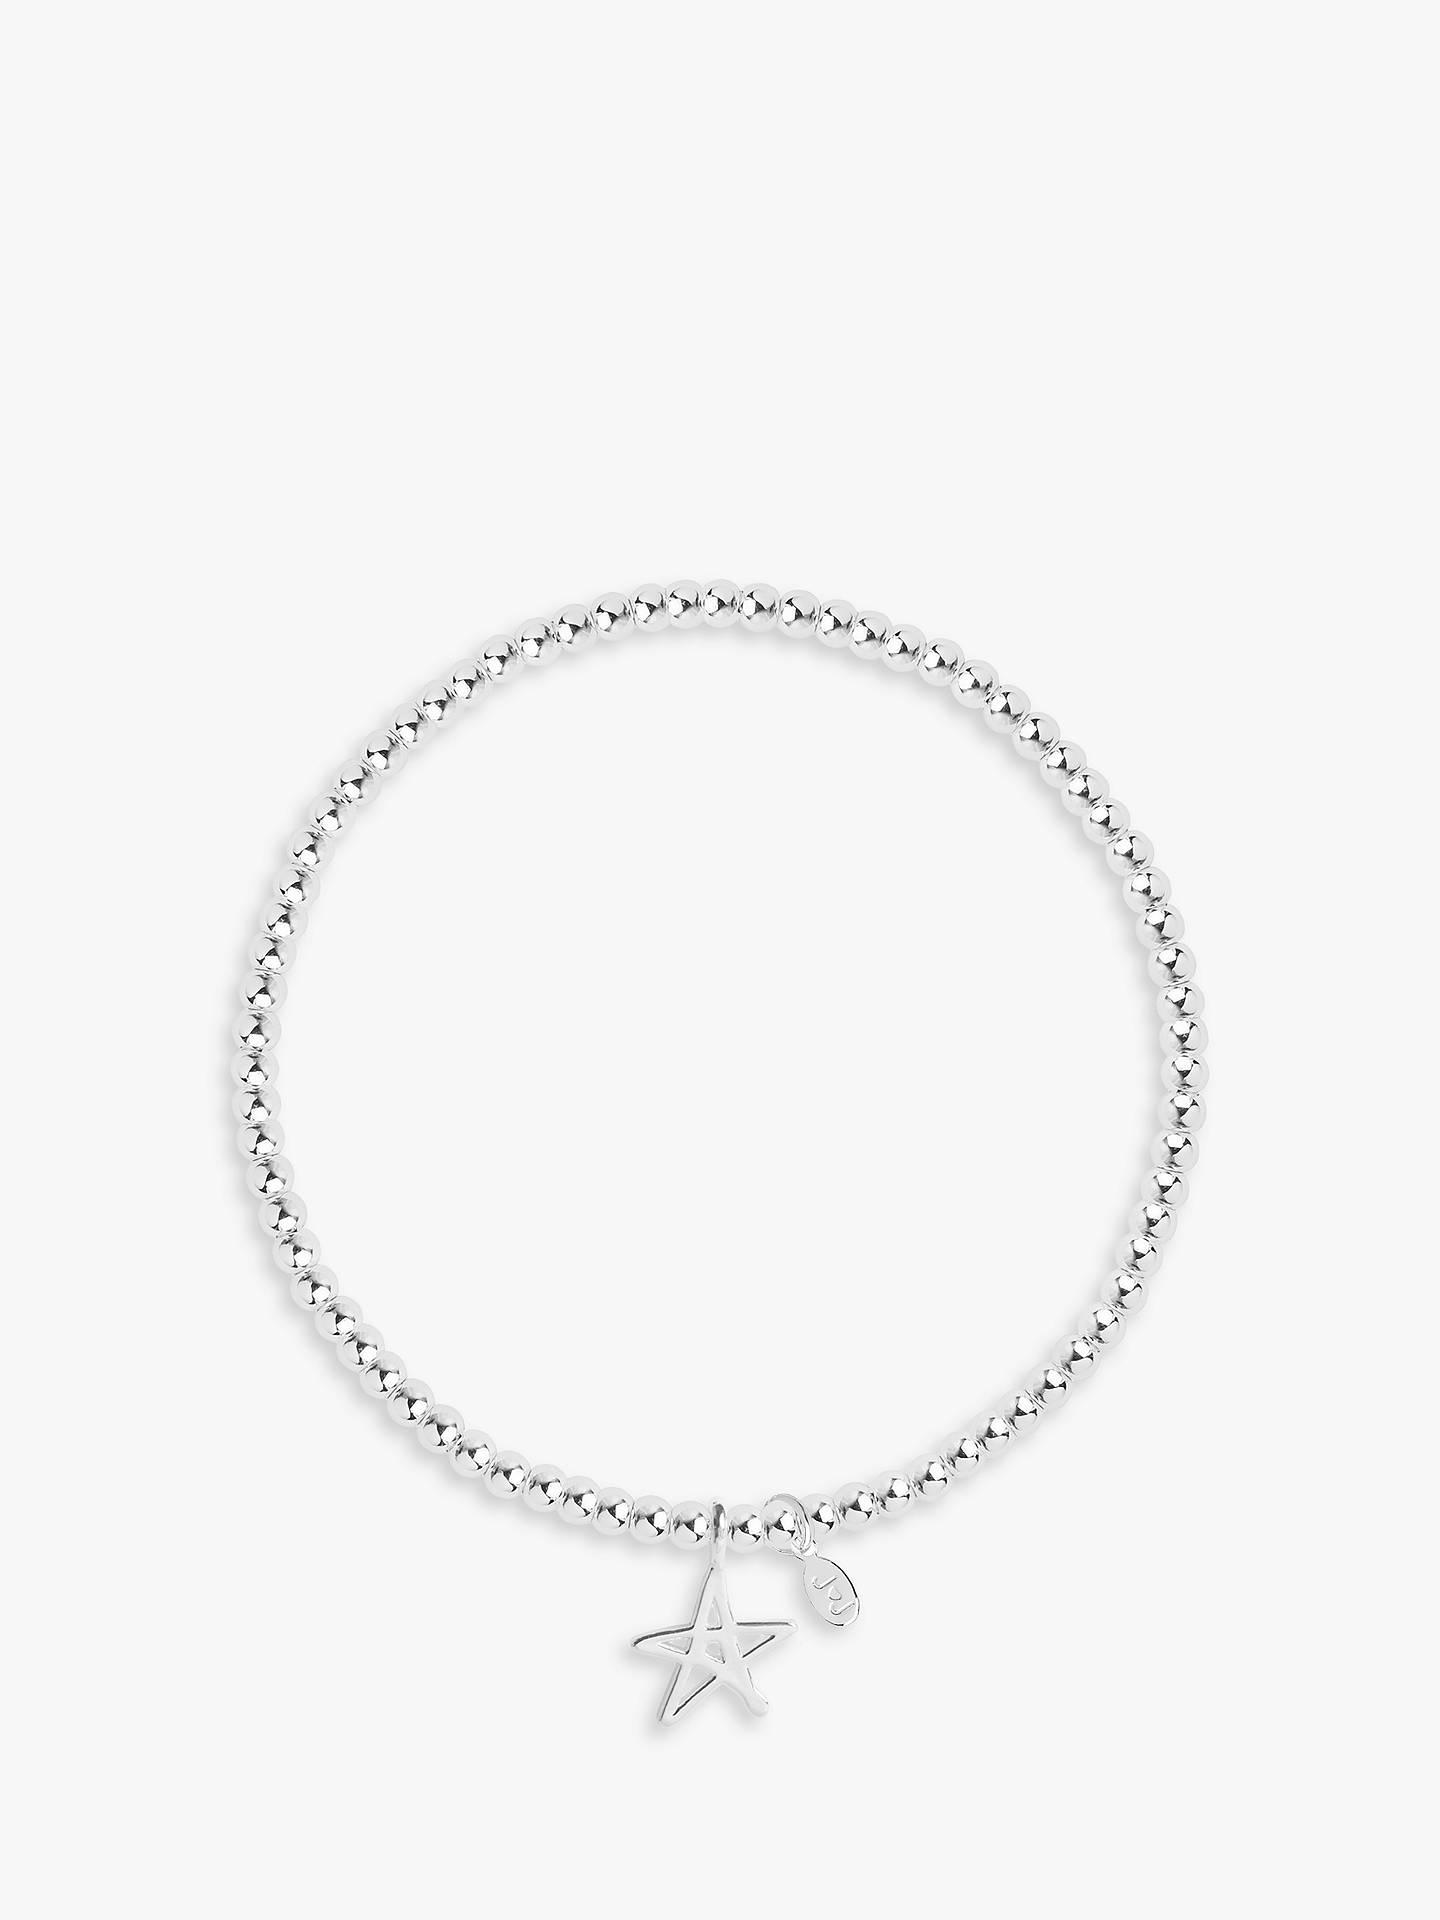 d467bc368d Buy Joma Jewellery Little Fabulous Friend Star Chain Bracelet, Silver  Online at johnlewis.com